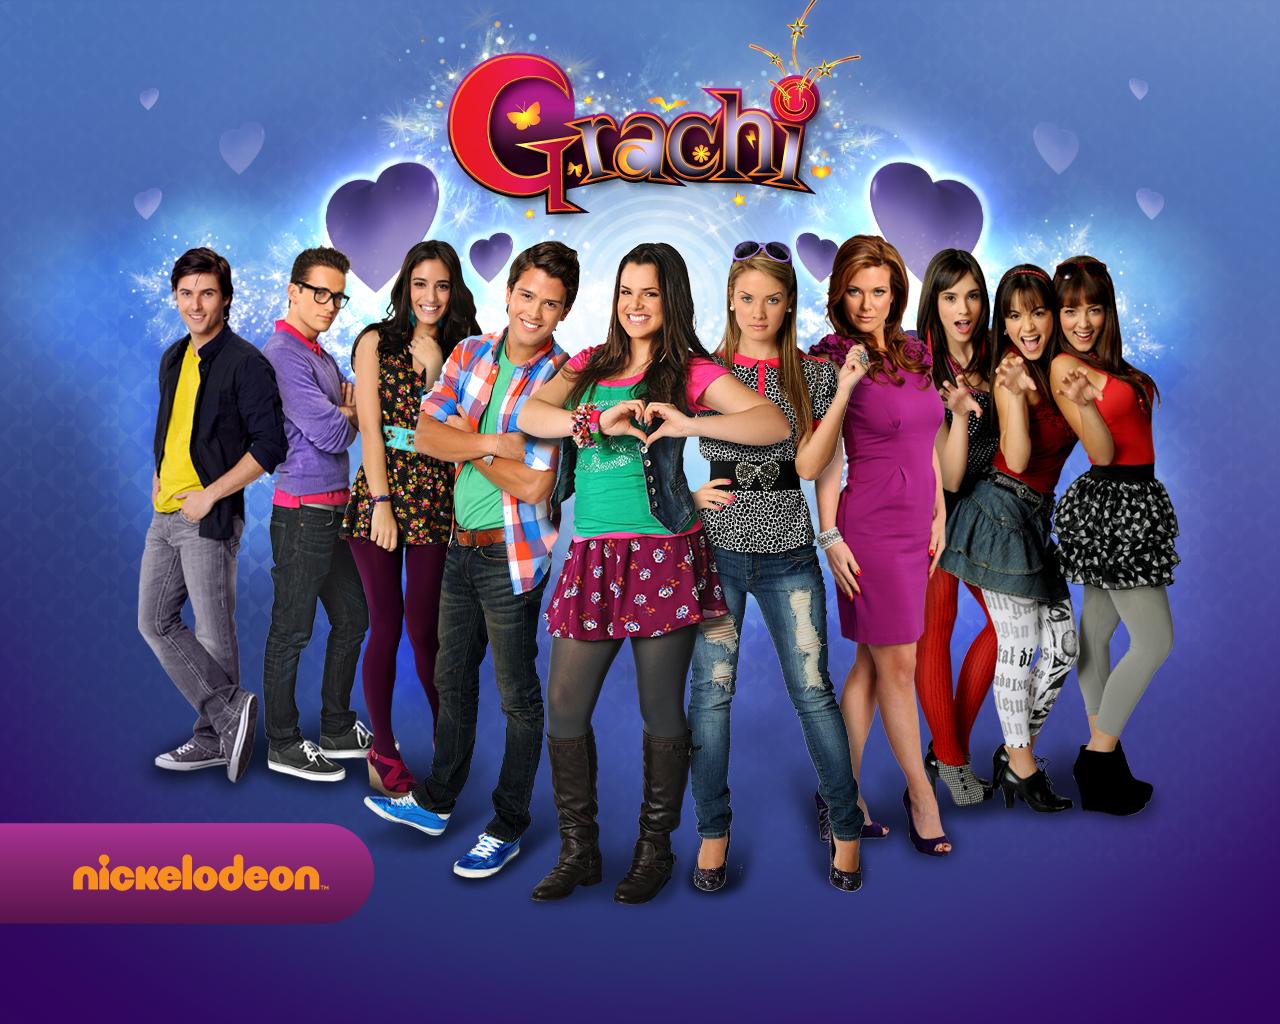 Nickelodeon grachi 3 temporada online dating